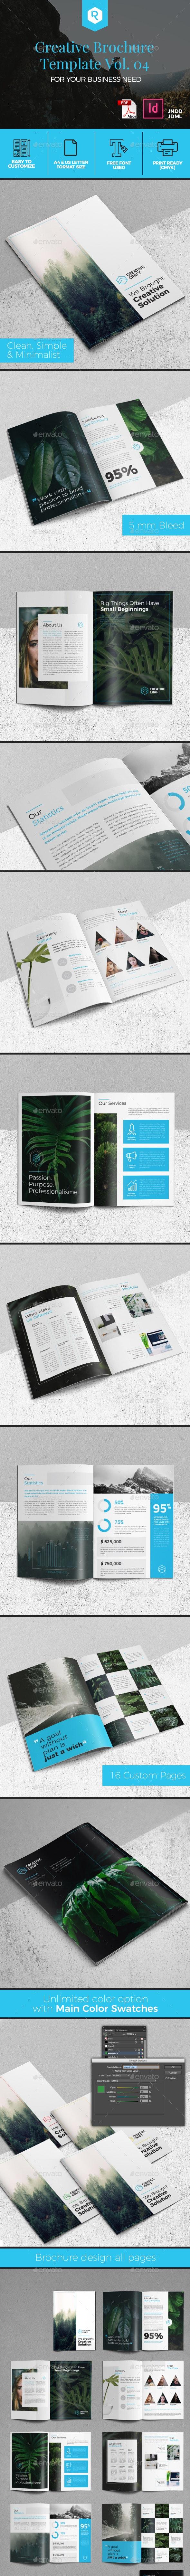 Creative Brochure Template Vol. 04 - Corporate Brochures